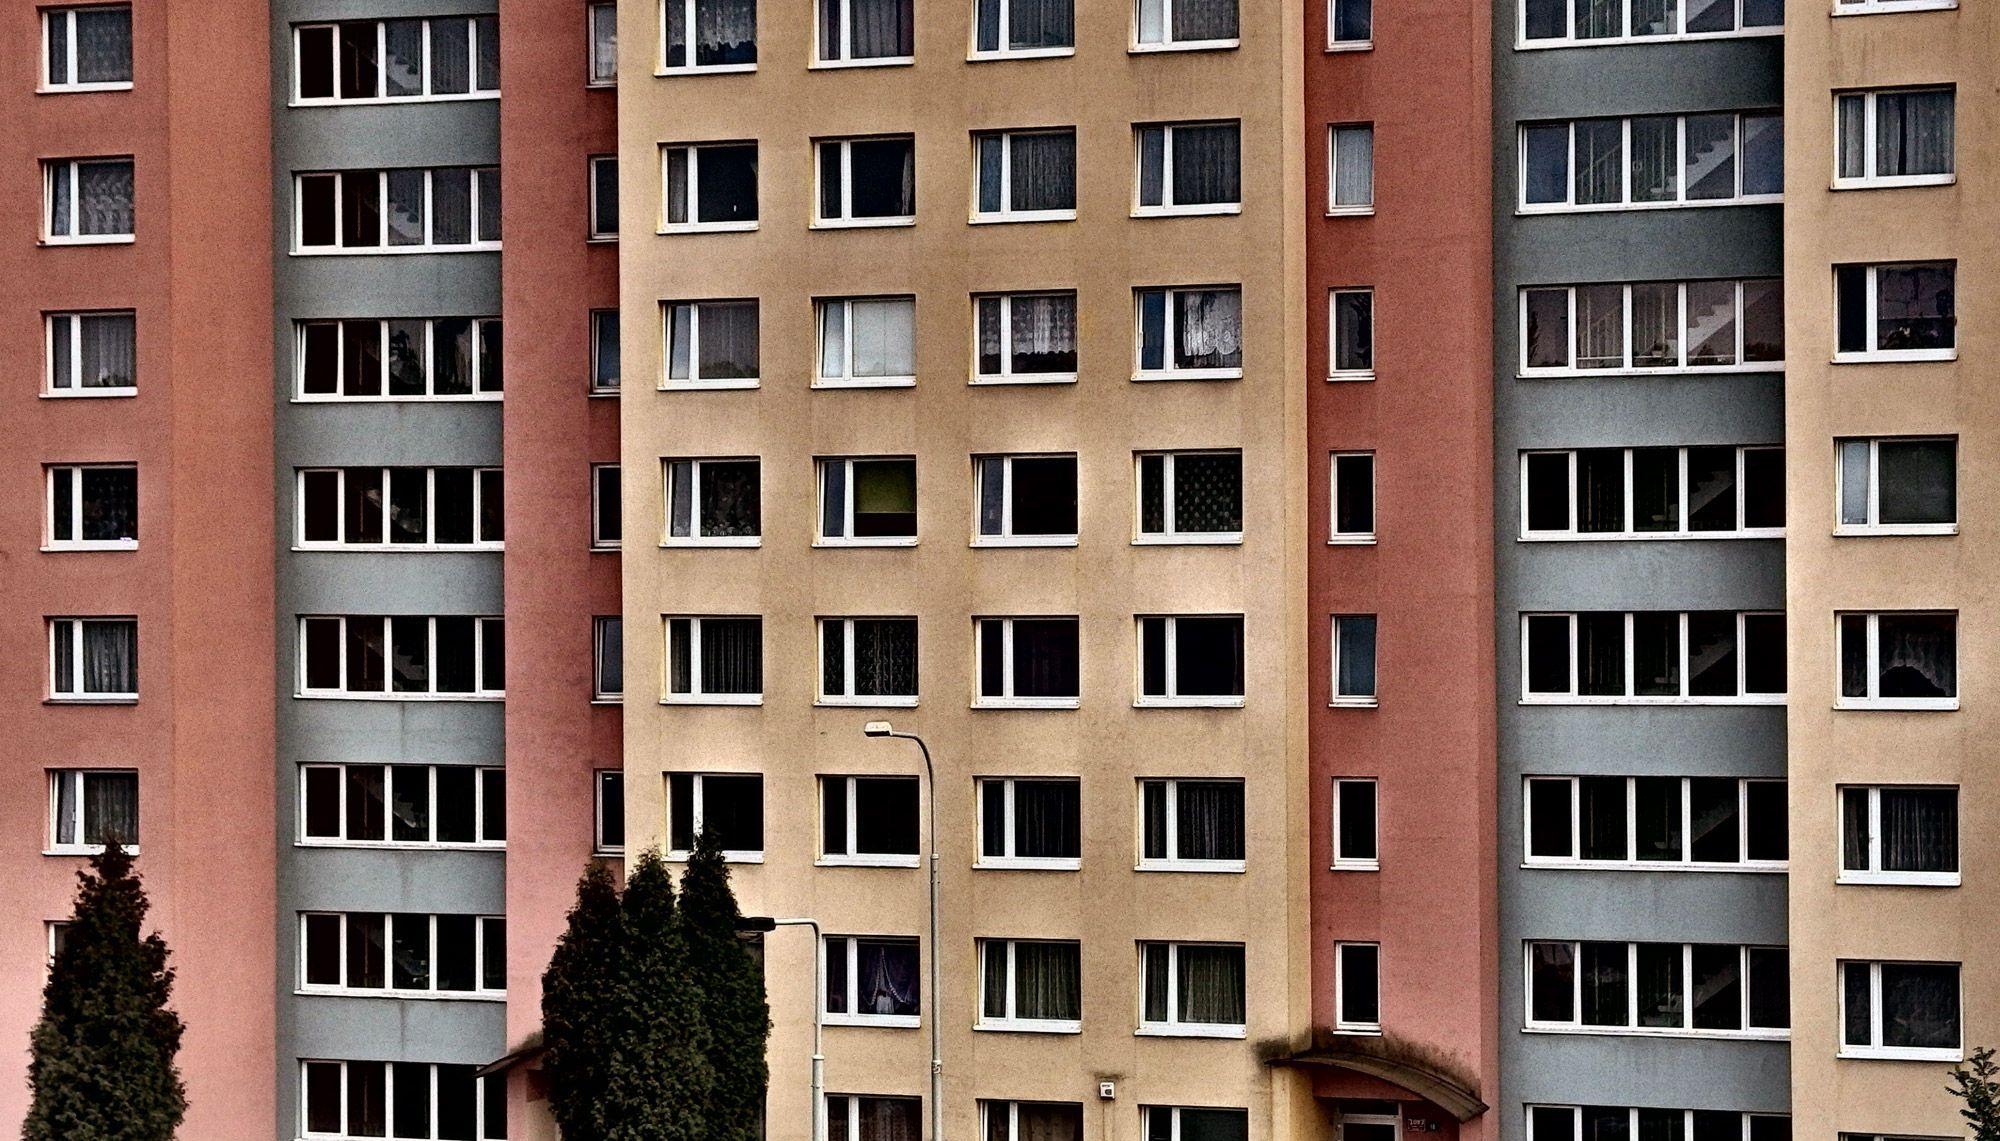 Panel House   FREE image on LibreShot